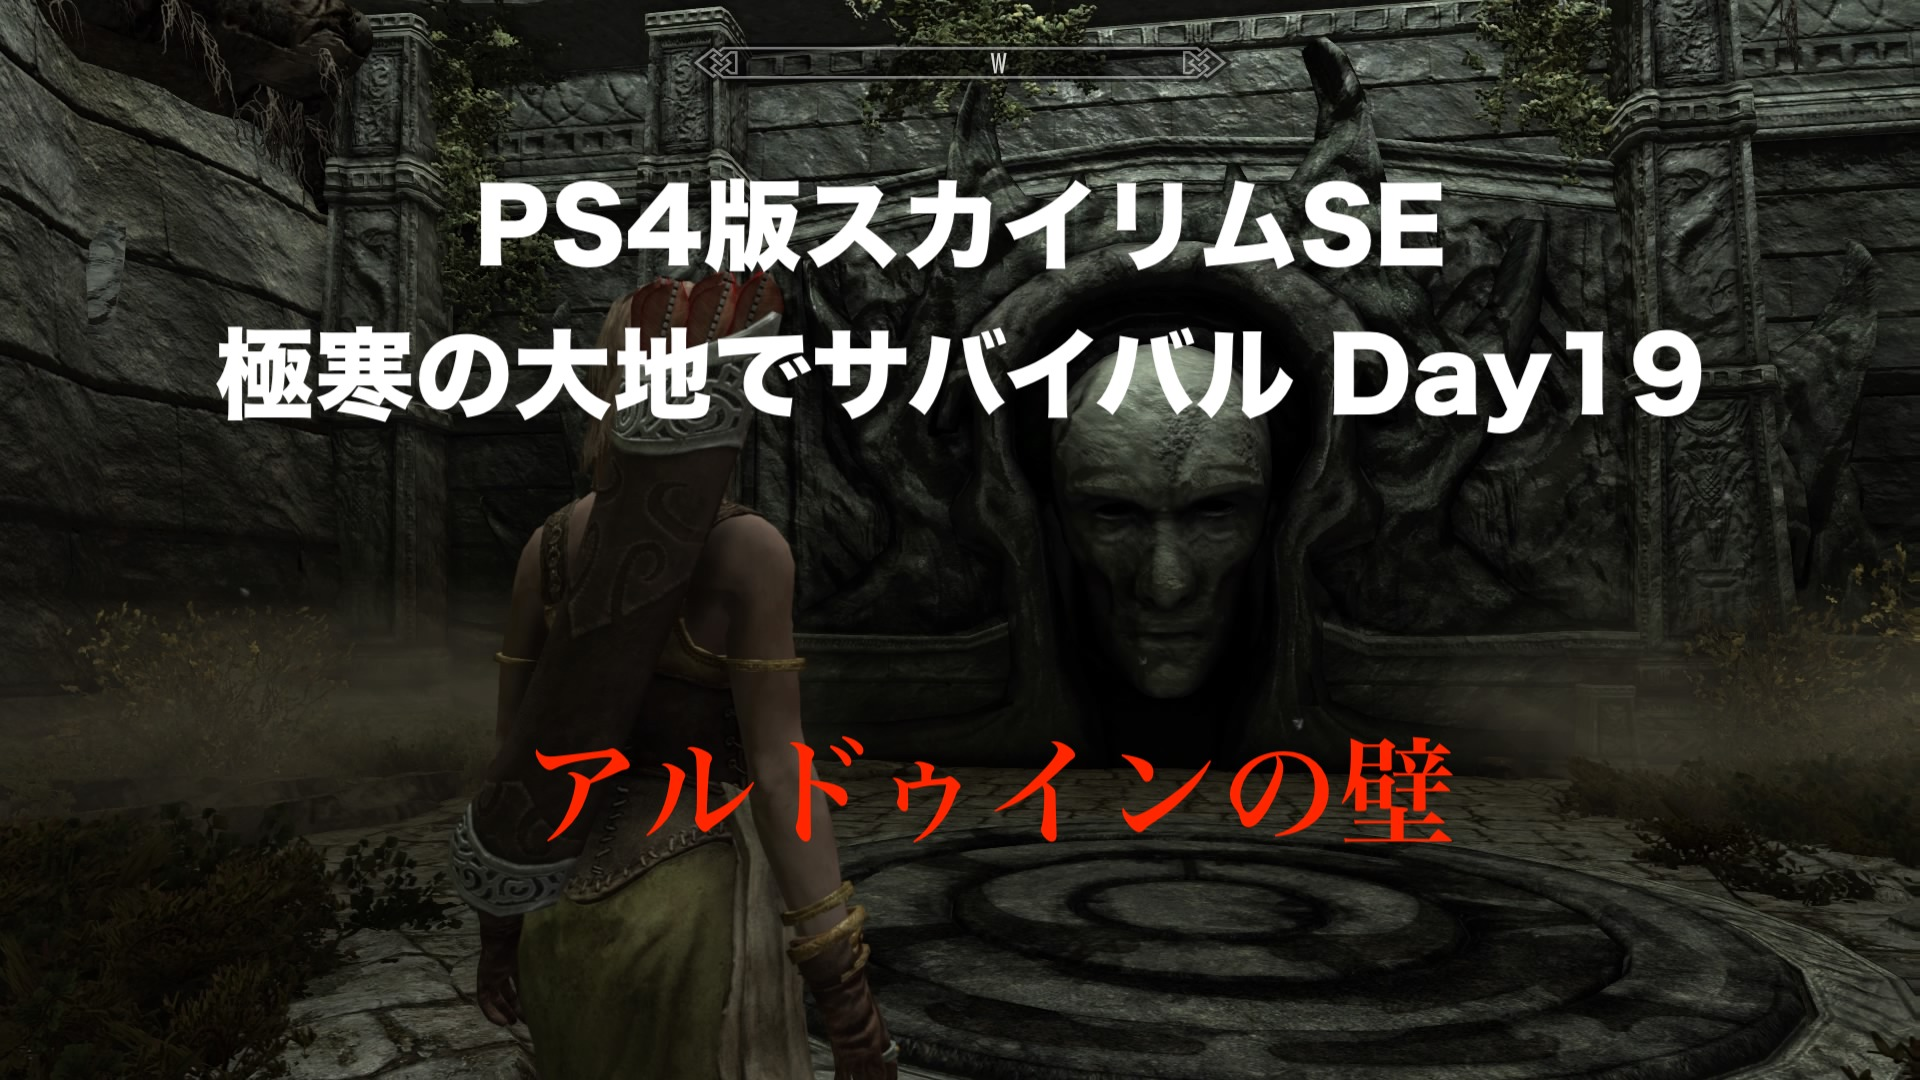 Ps4 mod スカイリム 神 [PS4,Skyrim] MOD紹介273